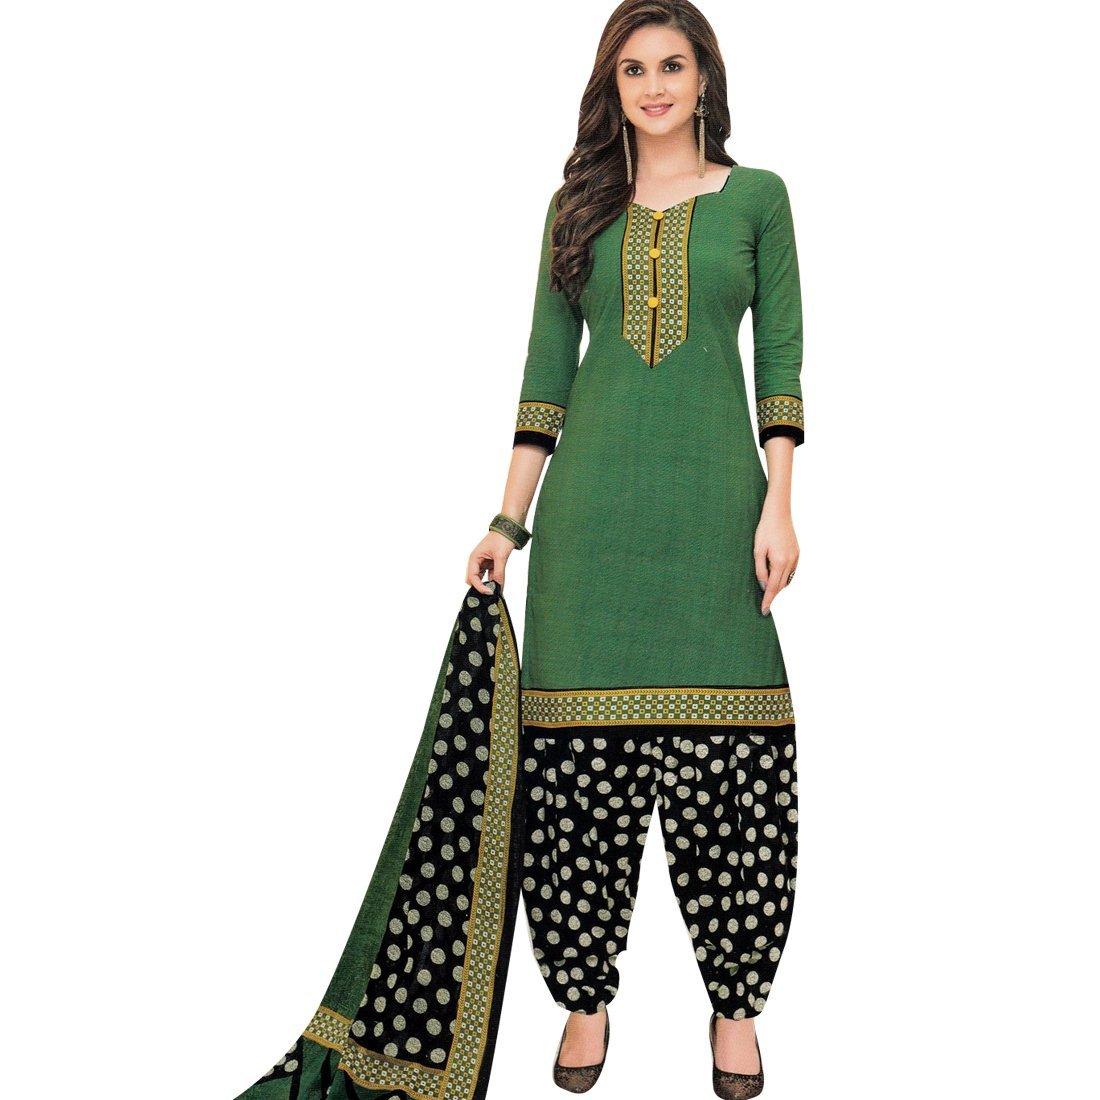 d752998e0c Amazon.com: Designer Printed Cotton Salwar Kameez Readymade Suit Indian  Dress: Clothing